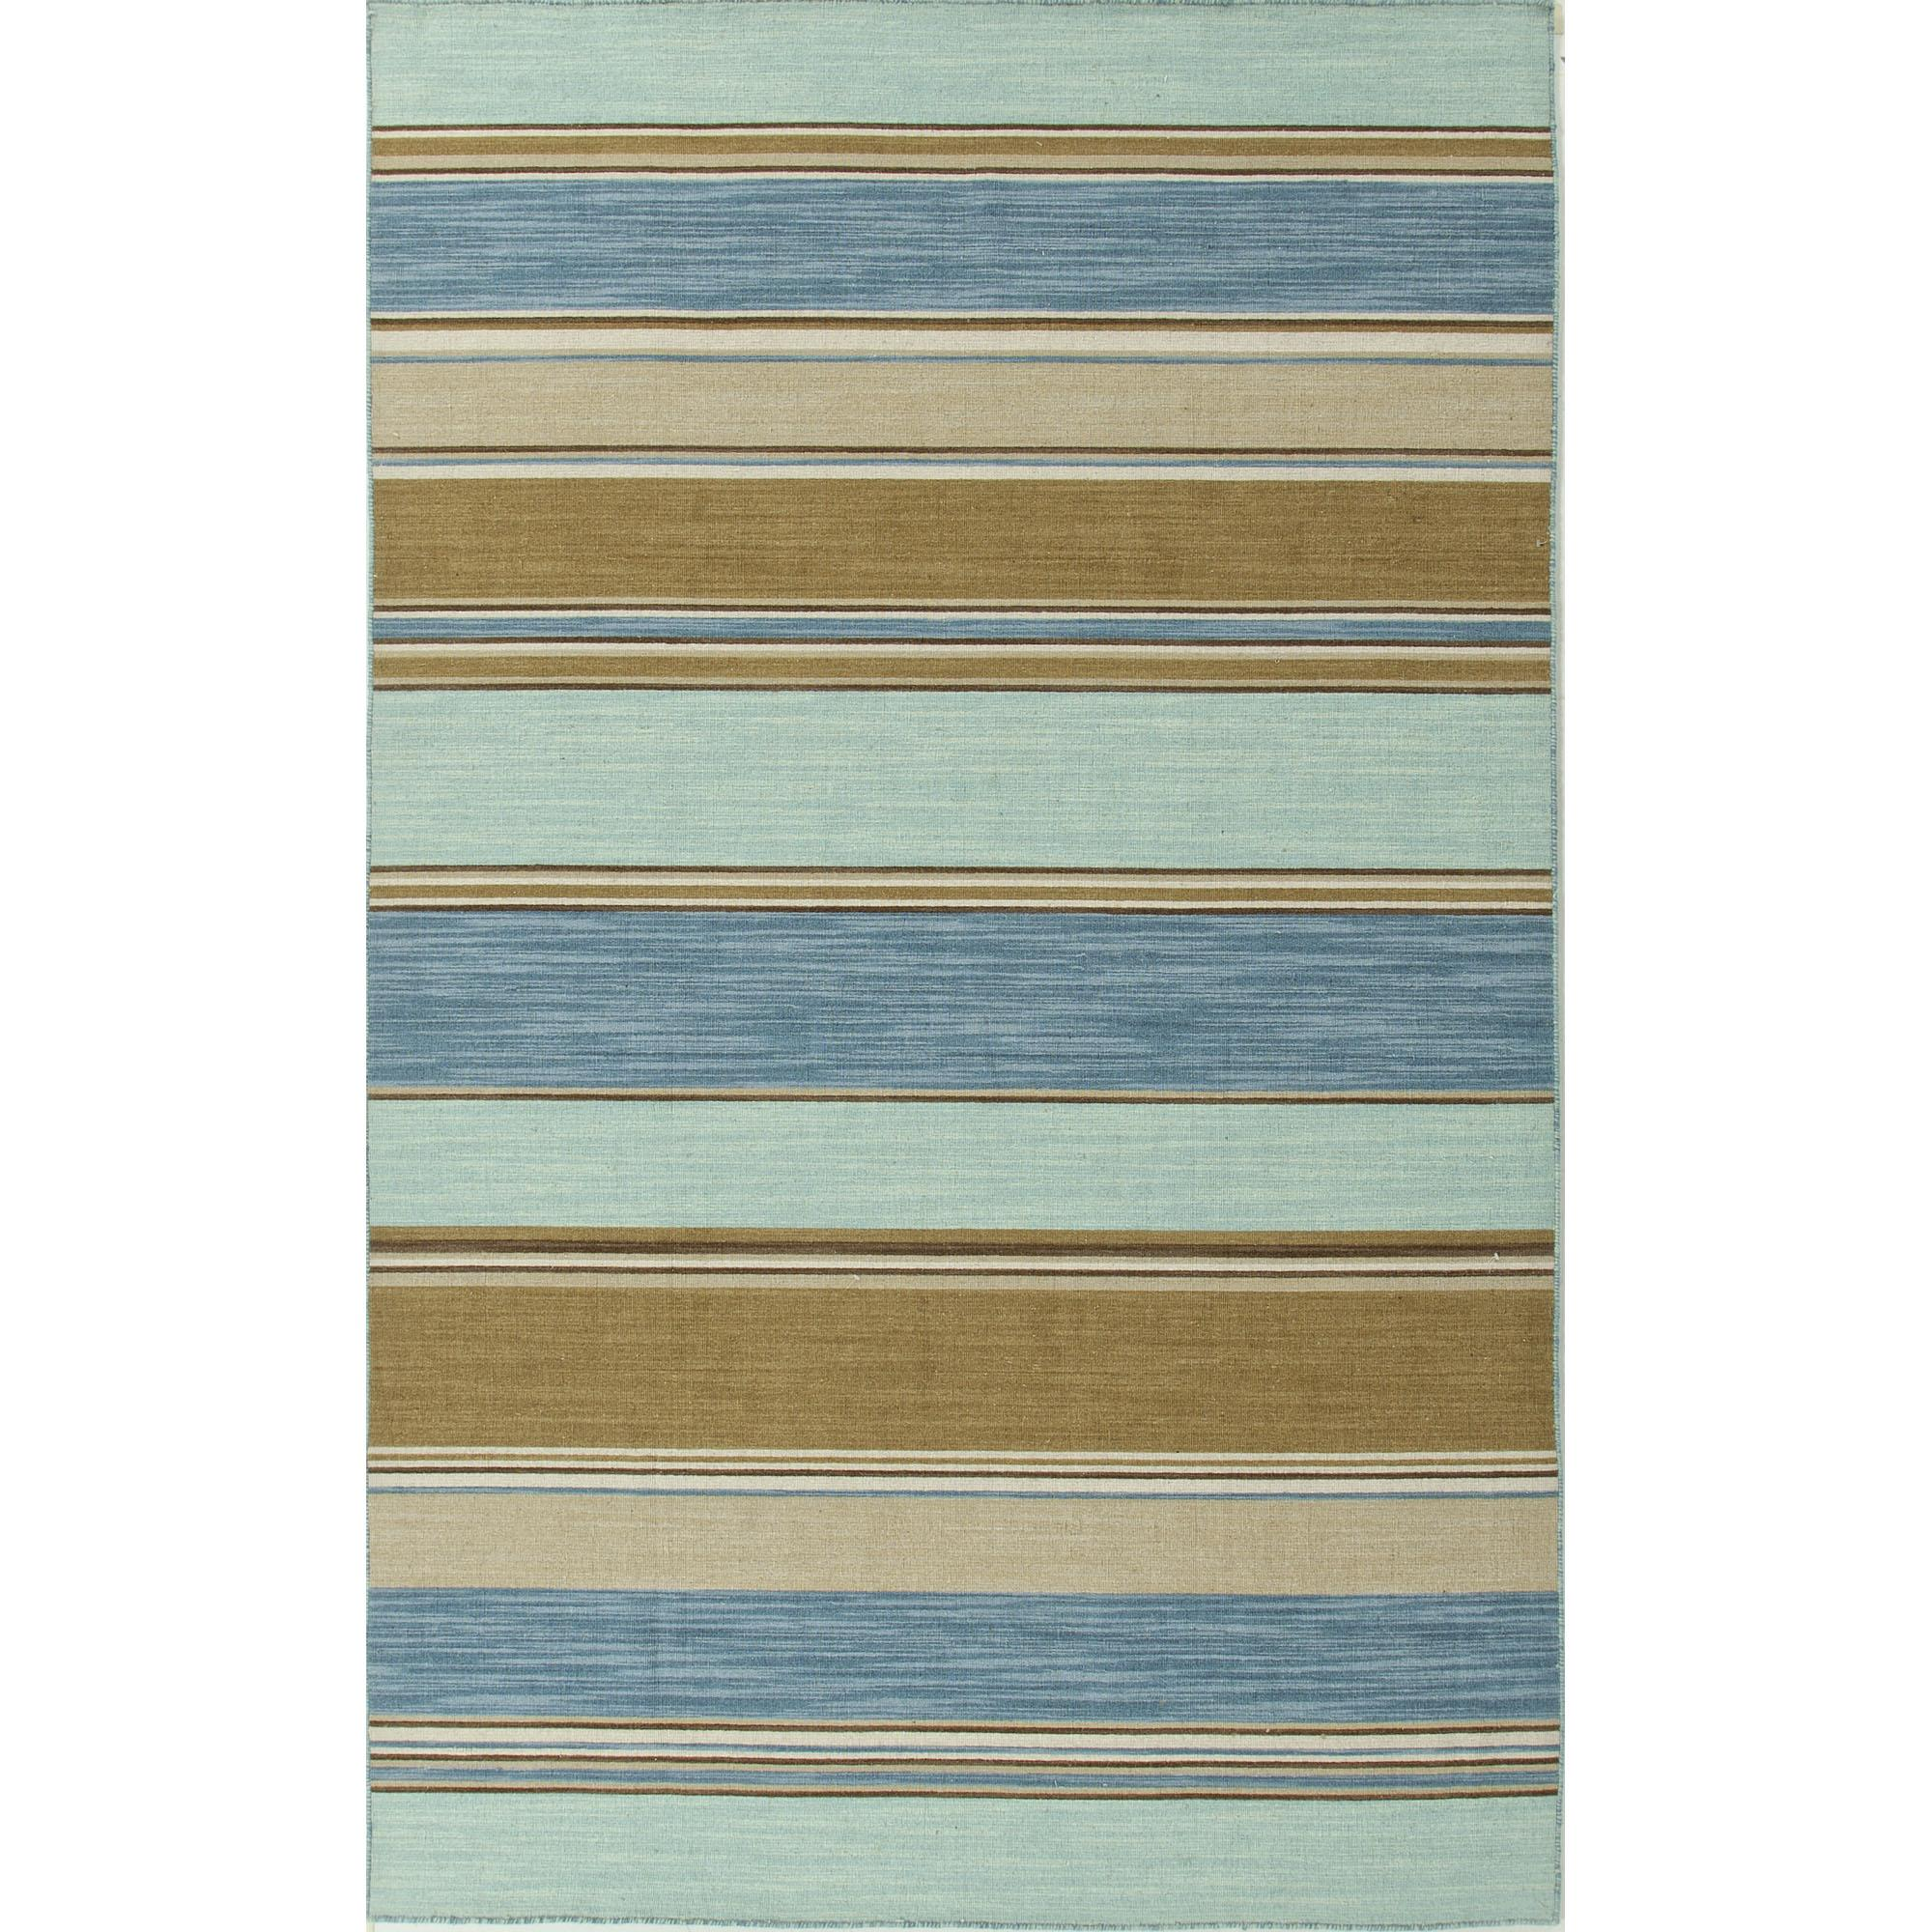 JAIPUR Rugs Coastal Shores 8 x 10 Rug - Item Number: RUG122433